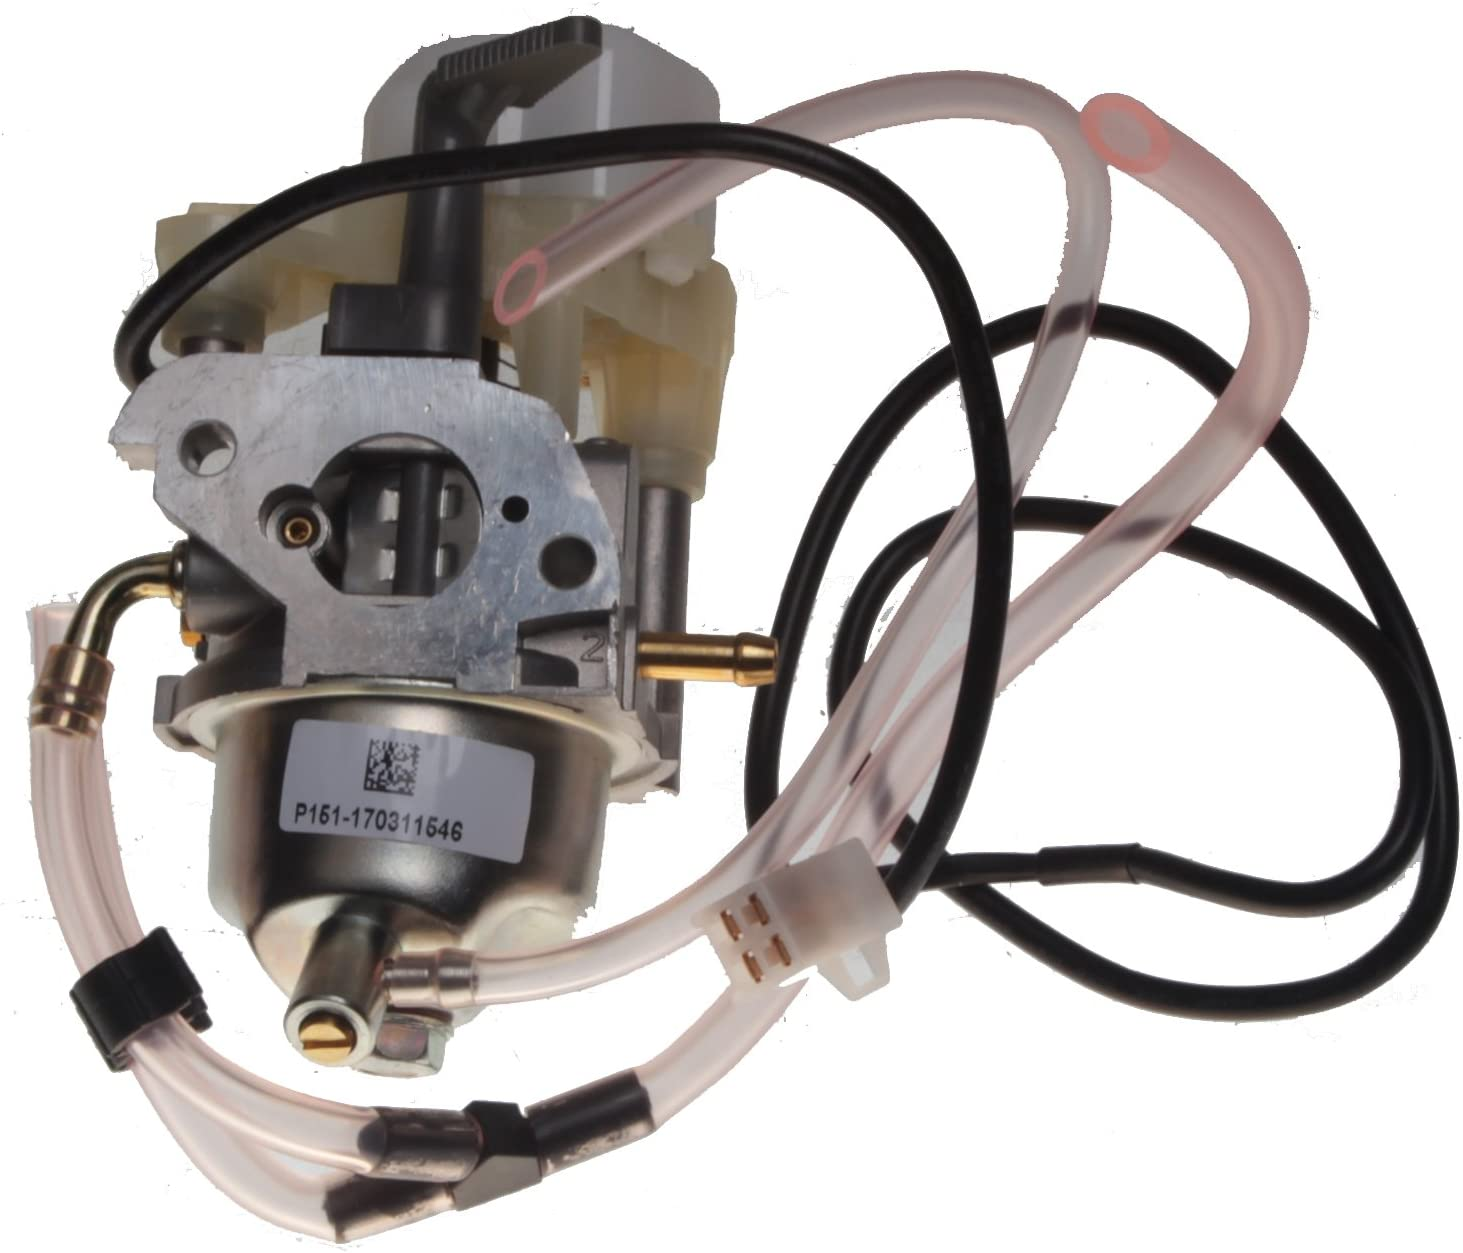 New Carburetor KG105-10000 for Kipor IG2000 IG2000S GS2000 KGE2000TI Generators